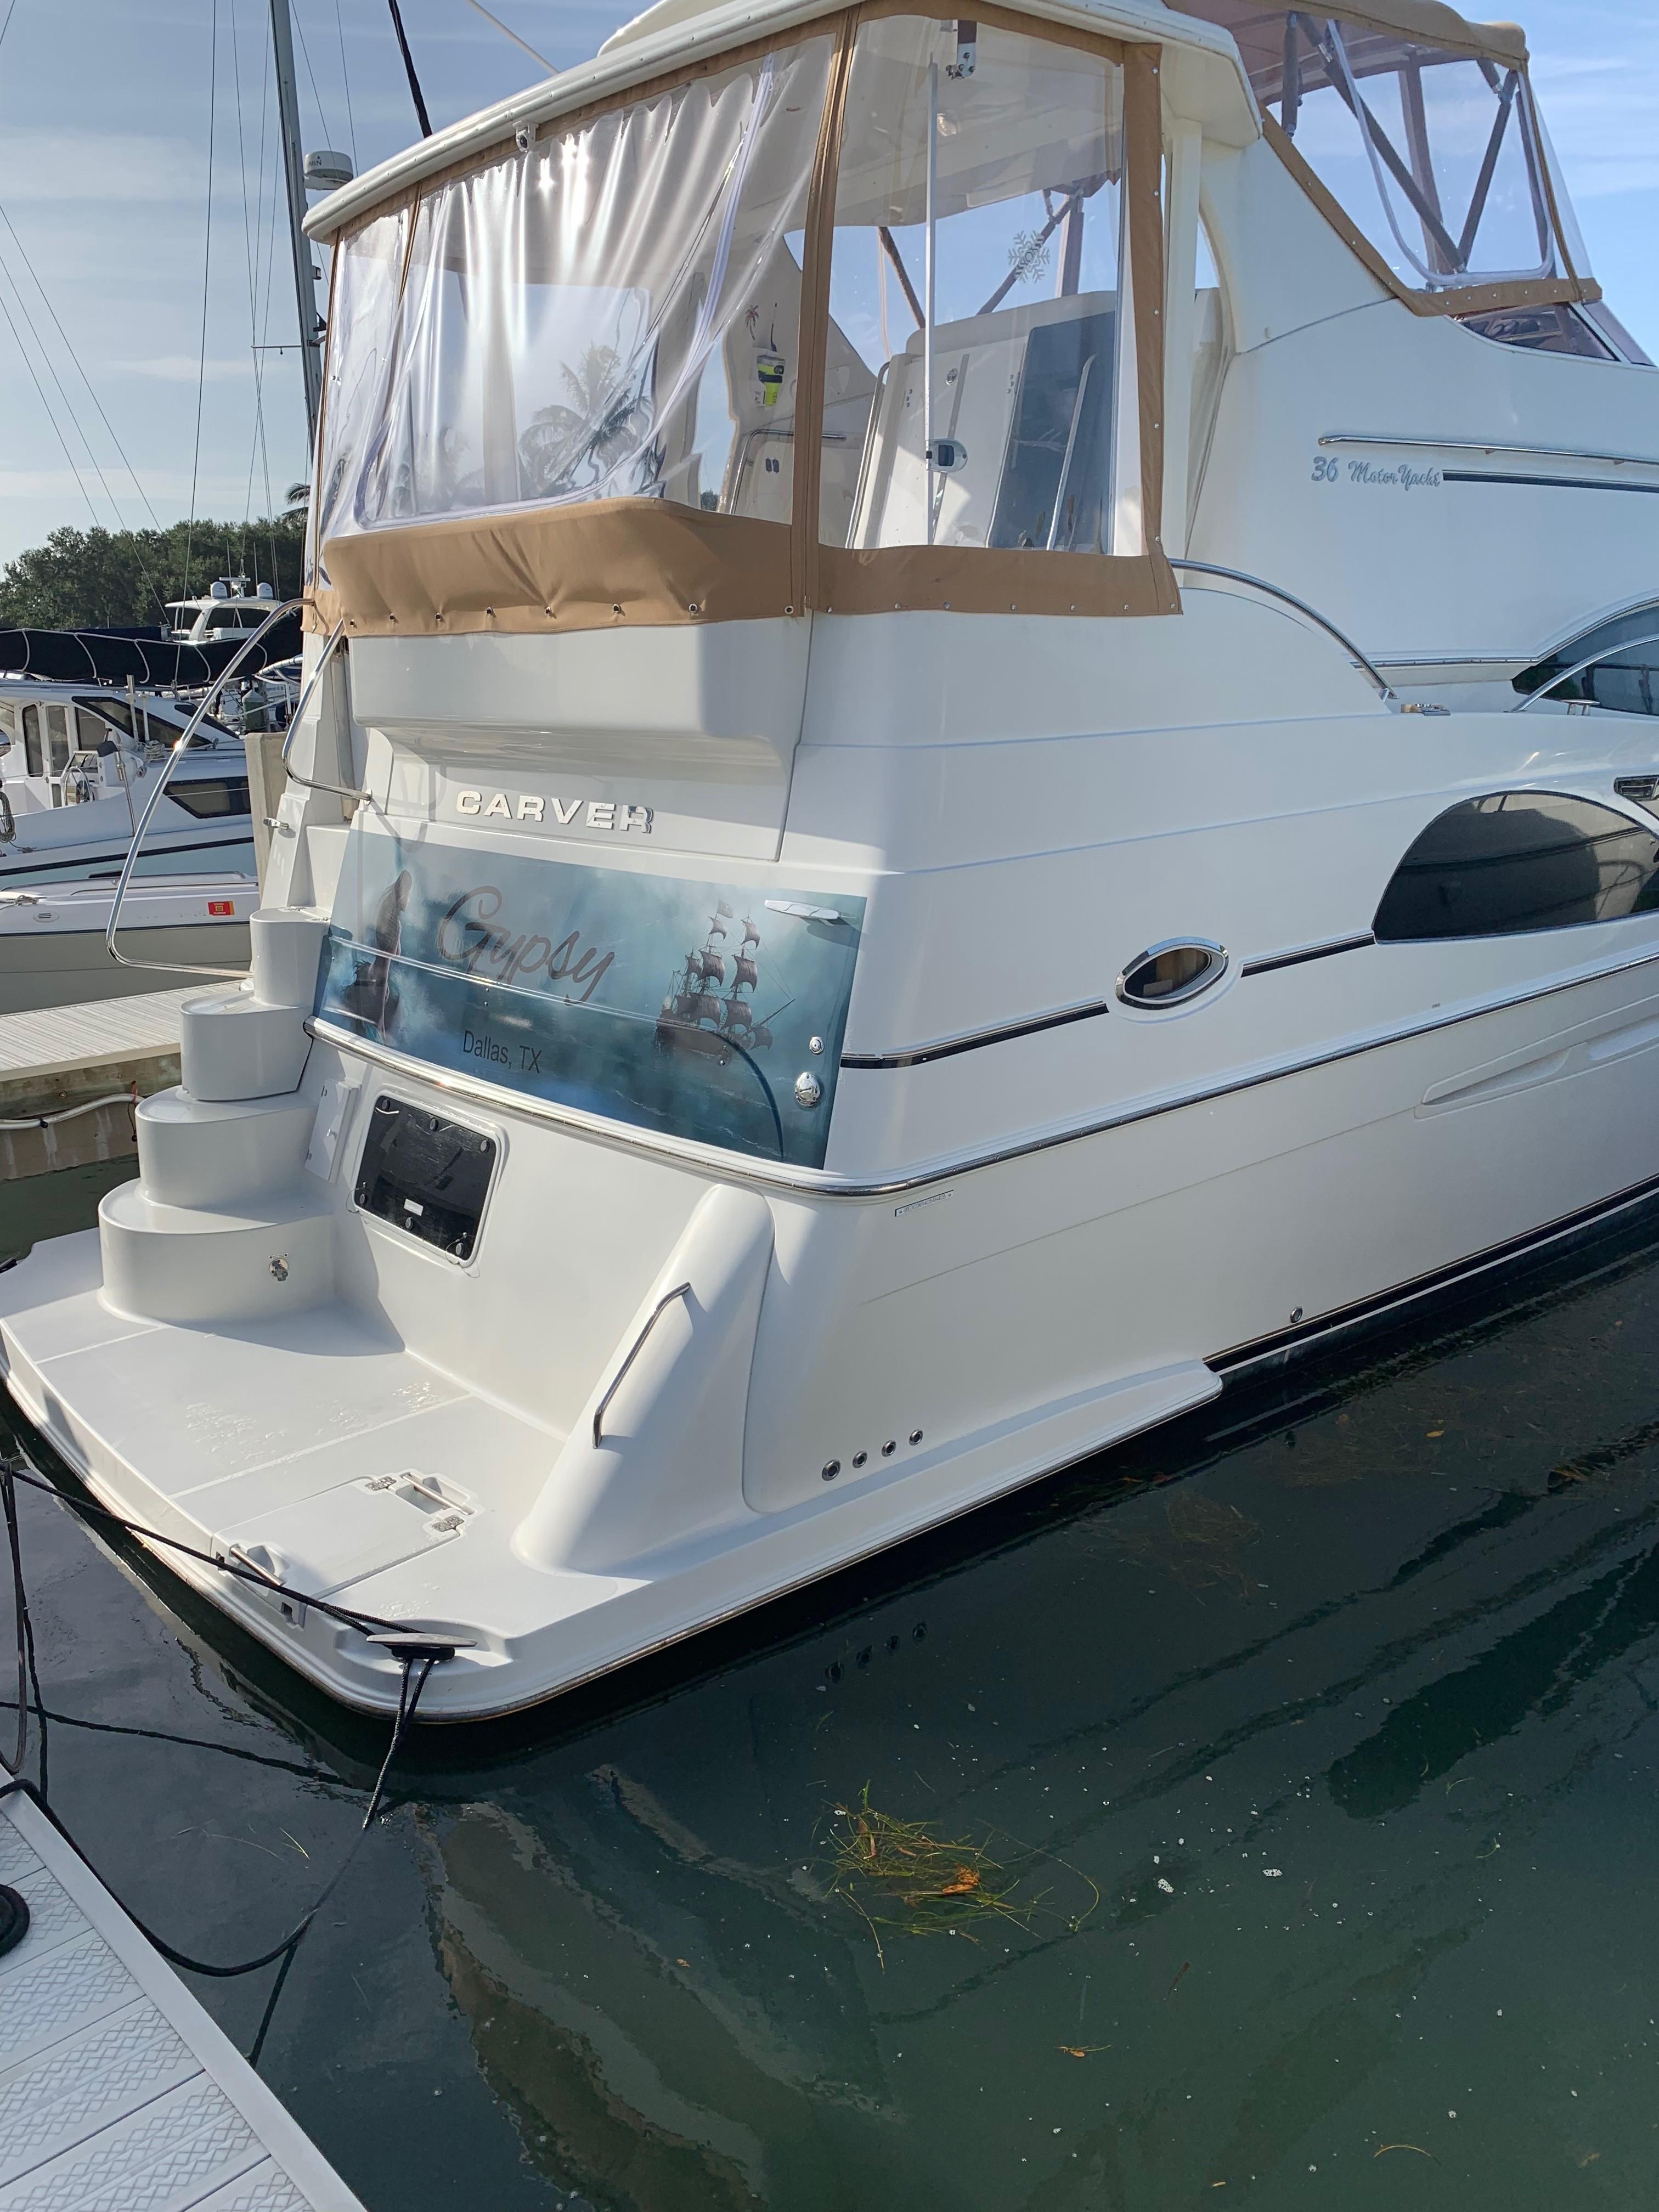 Carver 36 Motor Yacht - Transom